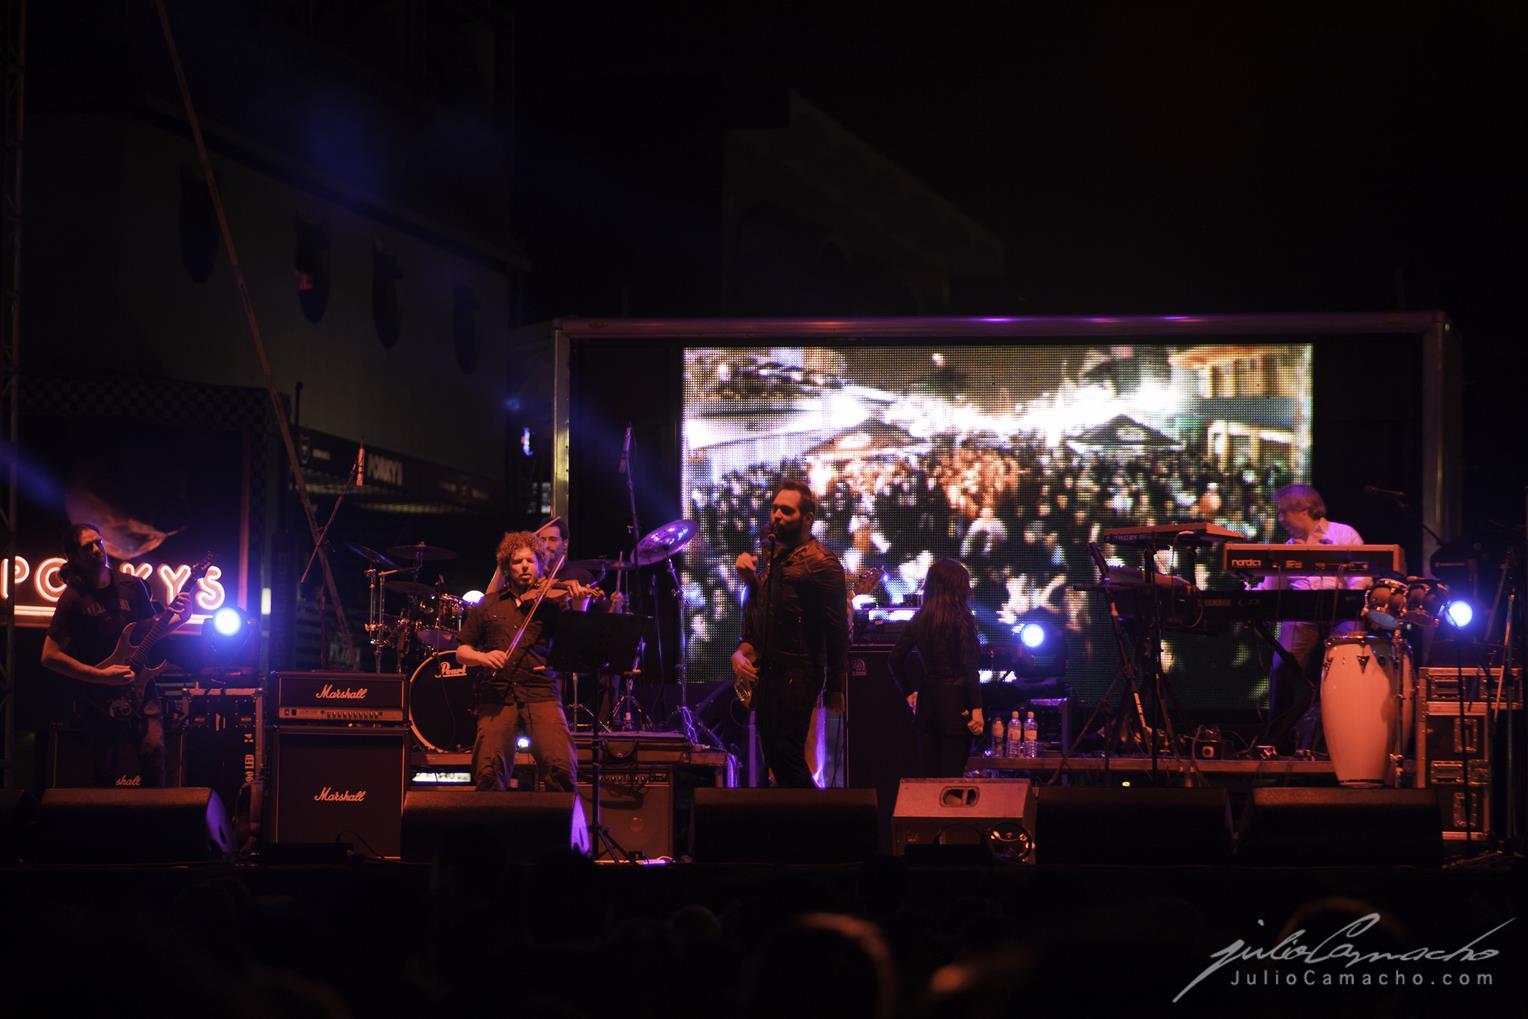 2014-10-30 31 CAST TOUR Ensenada y Tijuana - 1455 - www.Juli (Copy).jpg